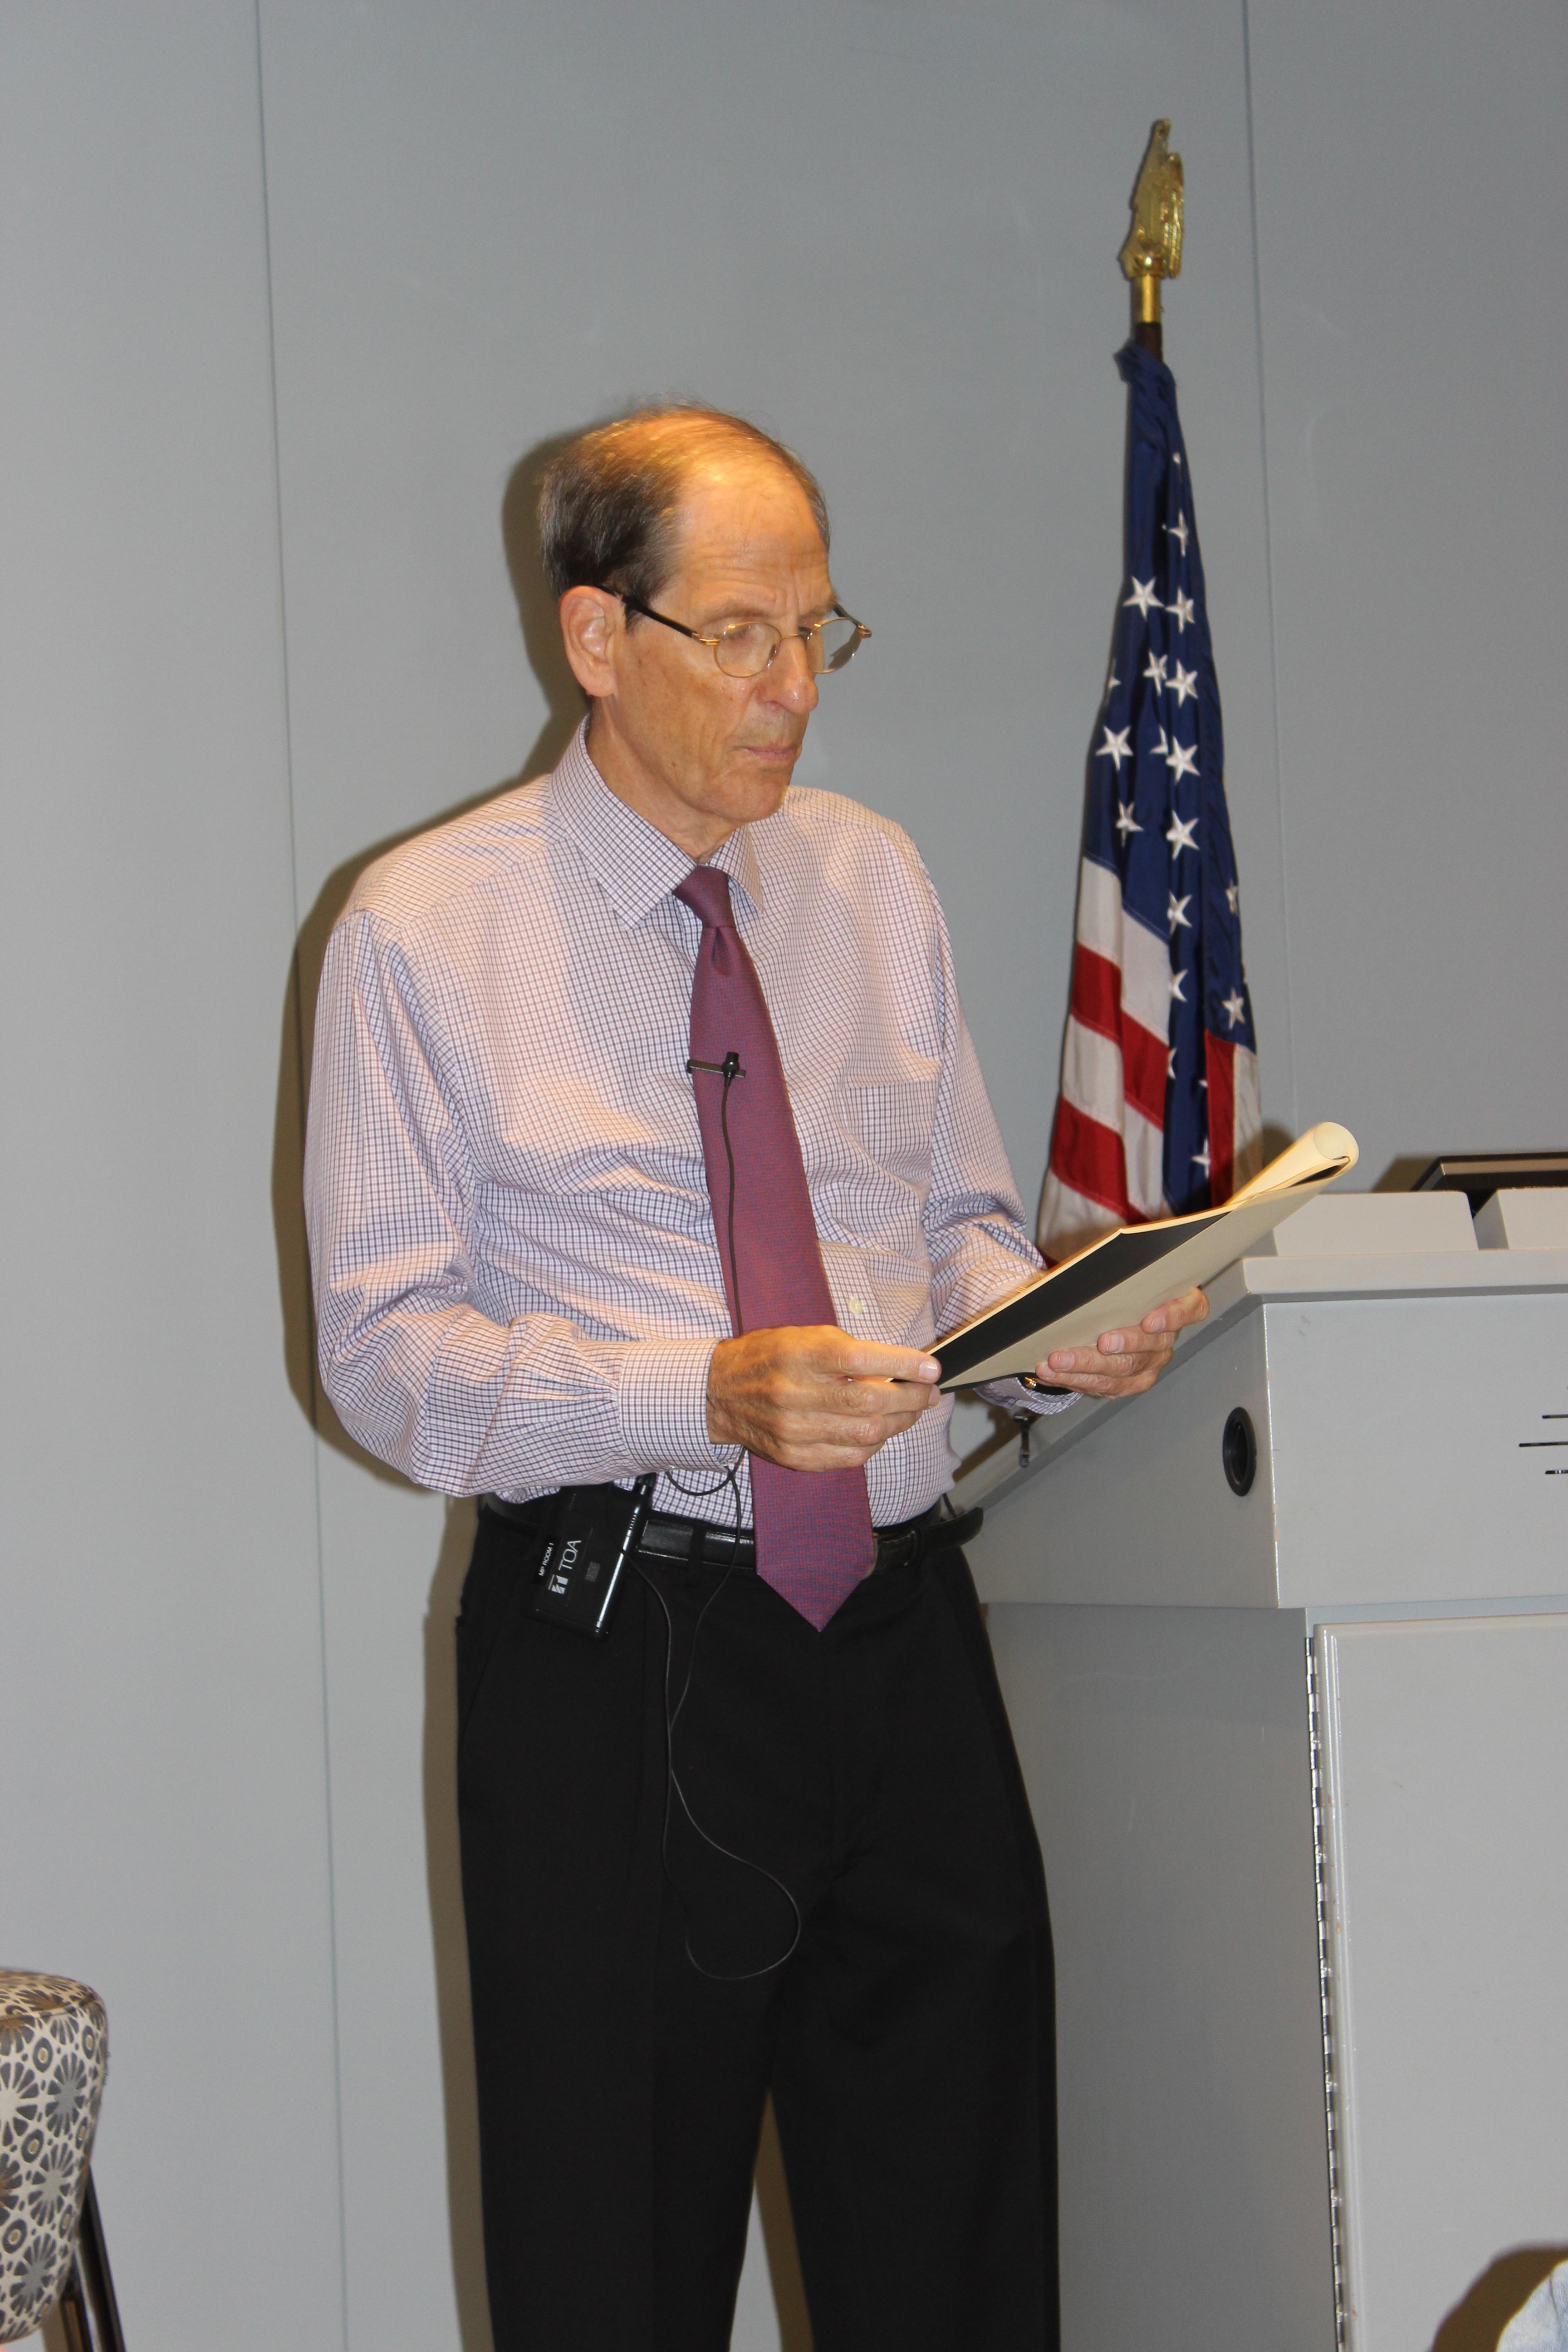 Michael Gould